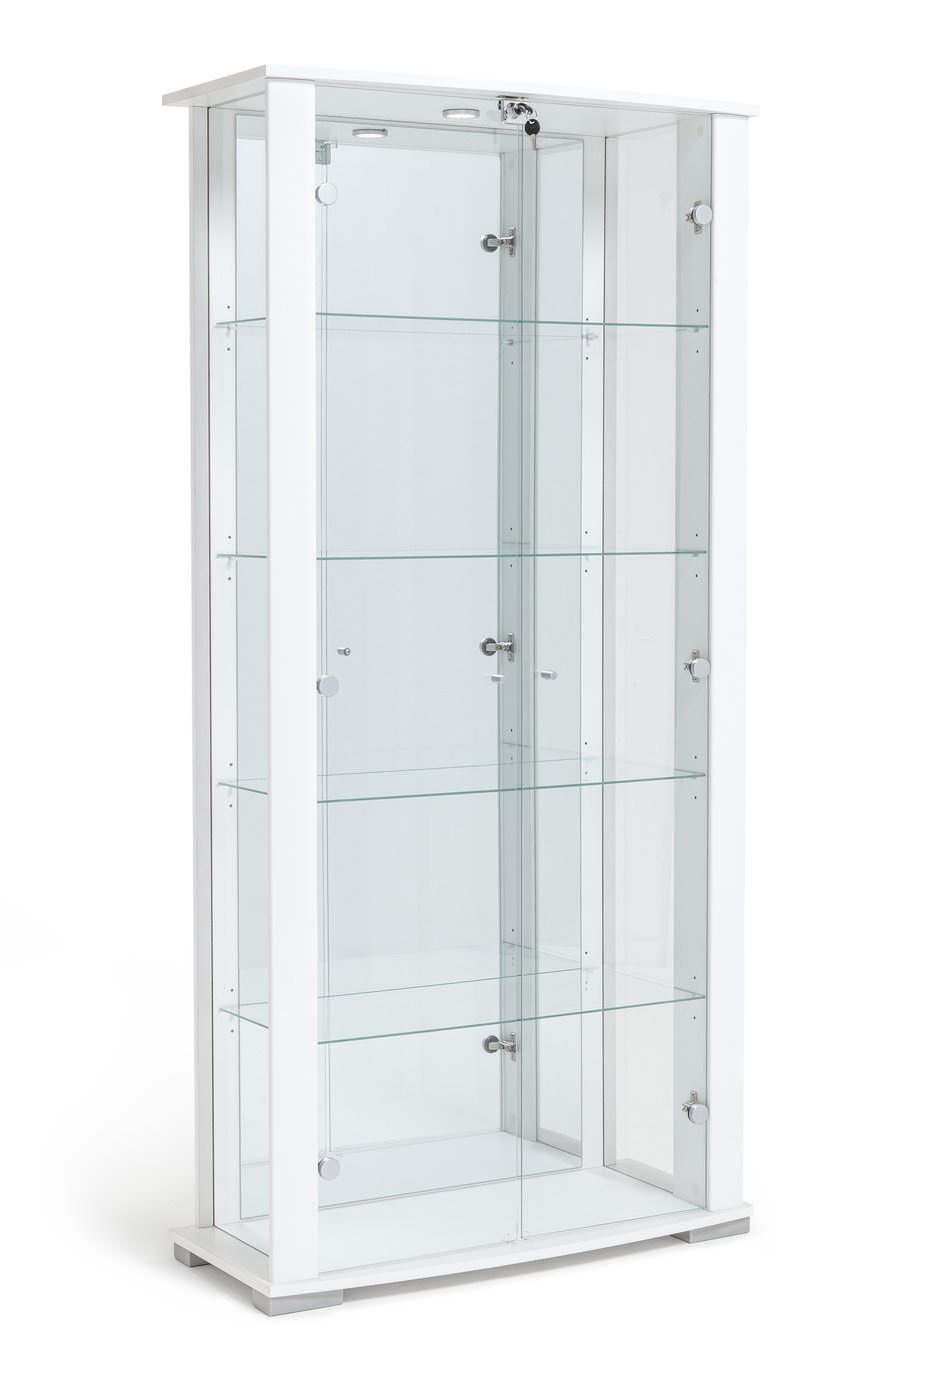 Argos Home Stella 2 Door Glass Display Cabinet - White Gloss